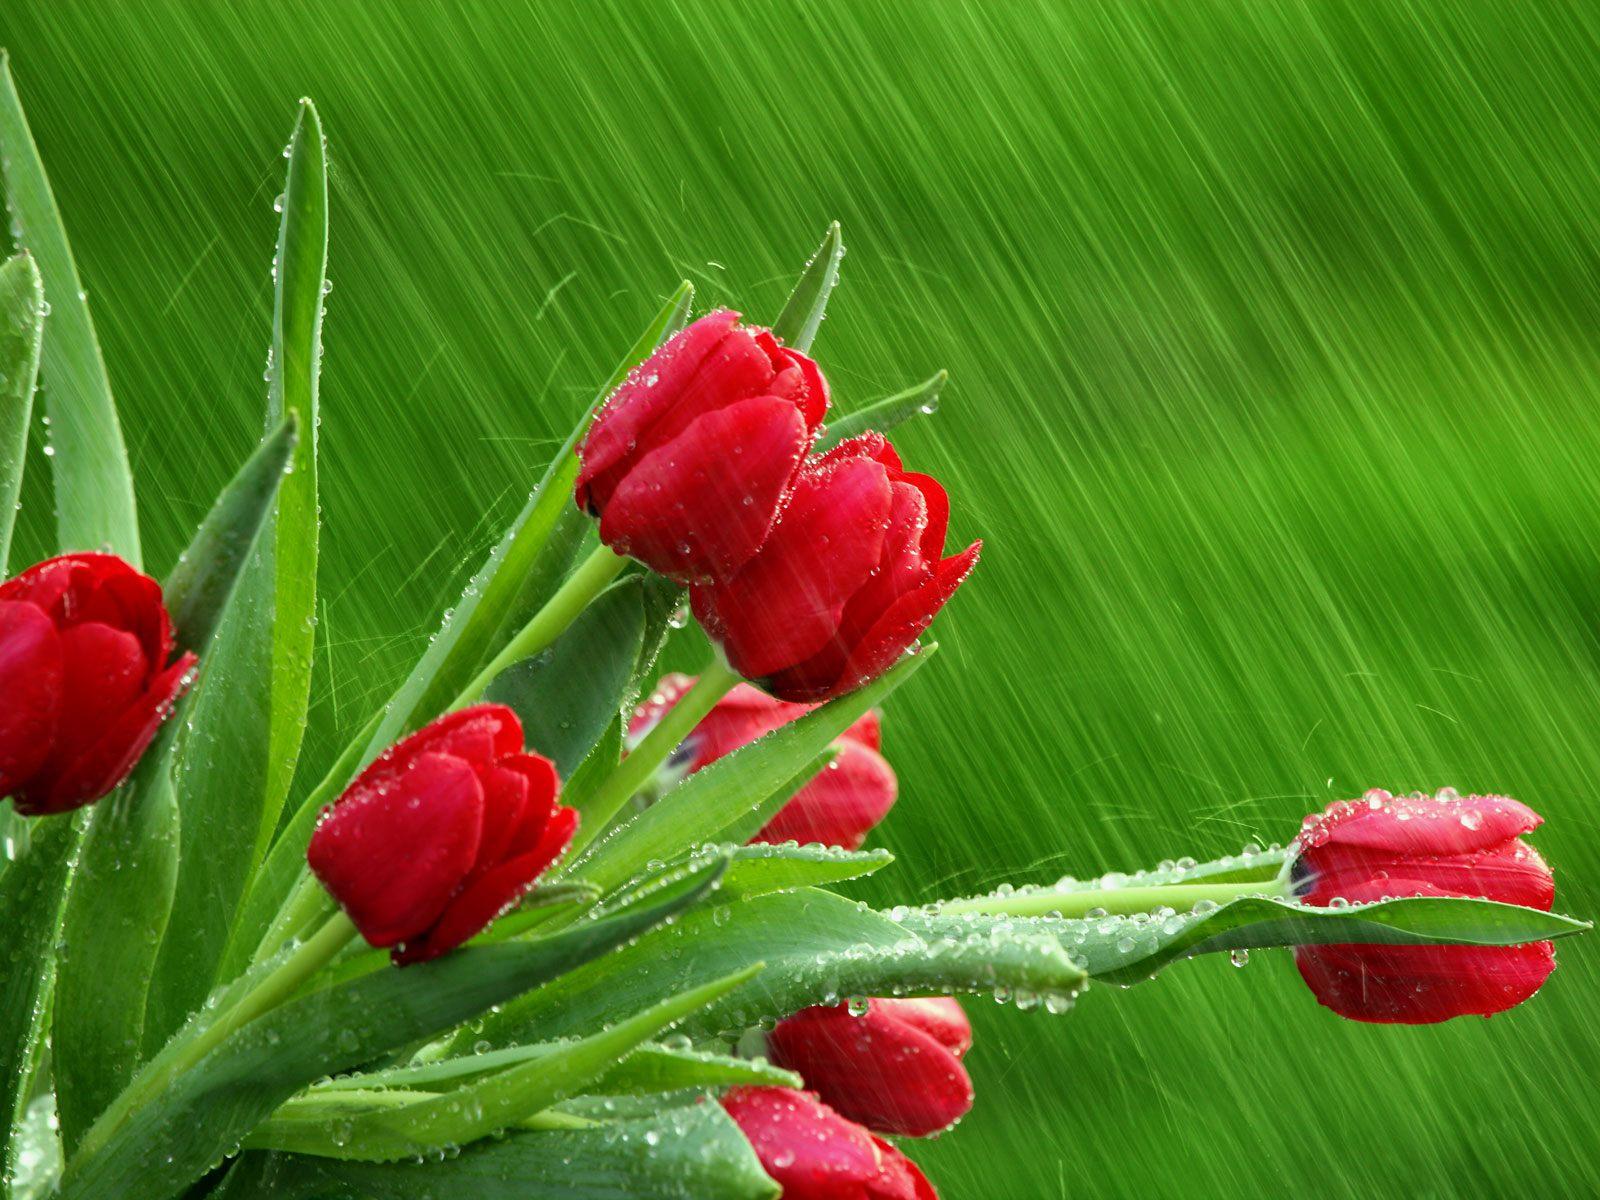 April Rain Wallpaper | Special Offers